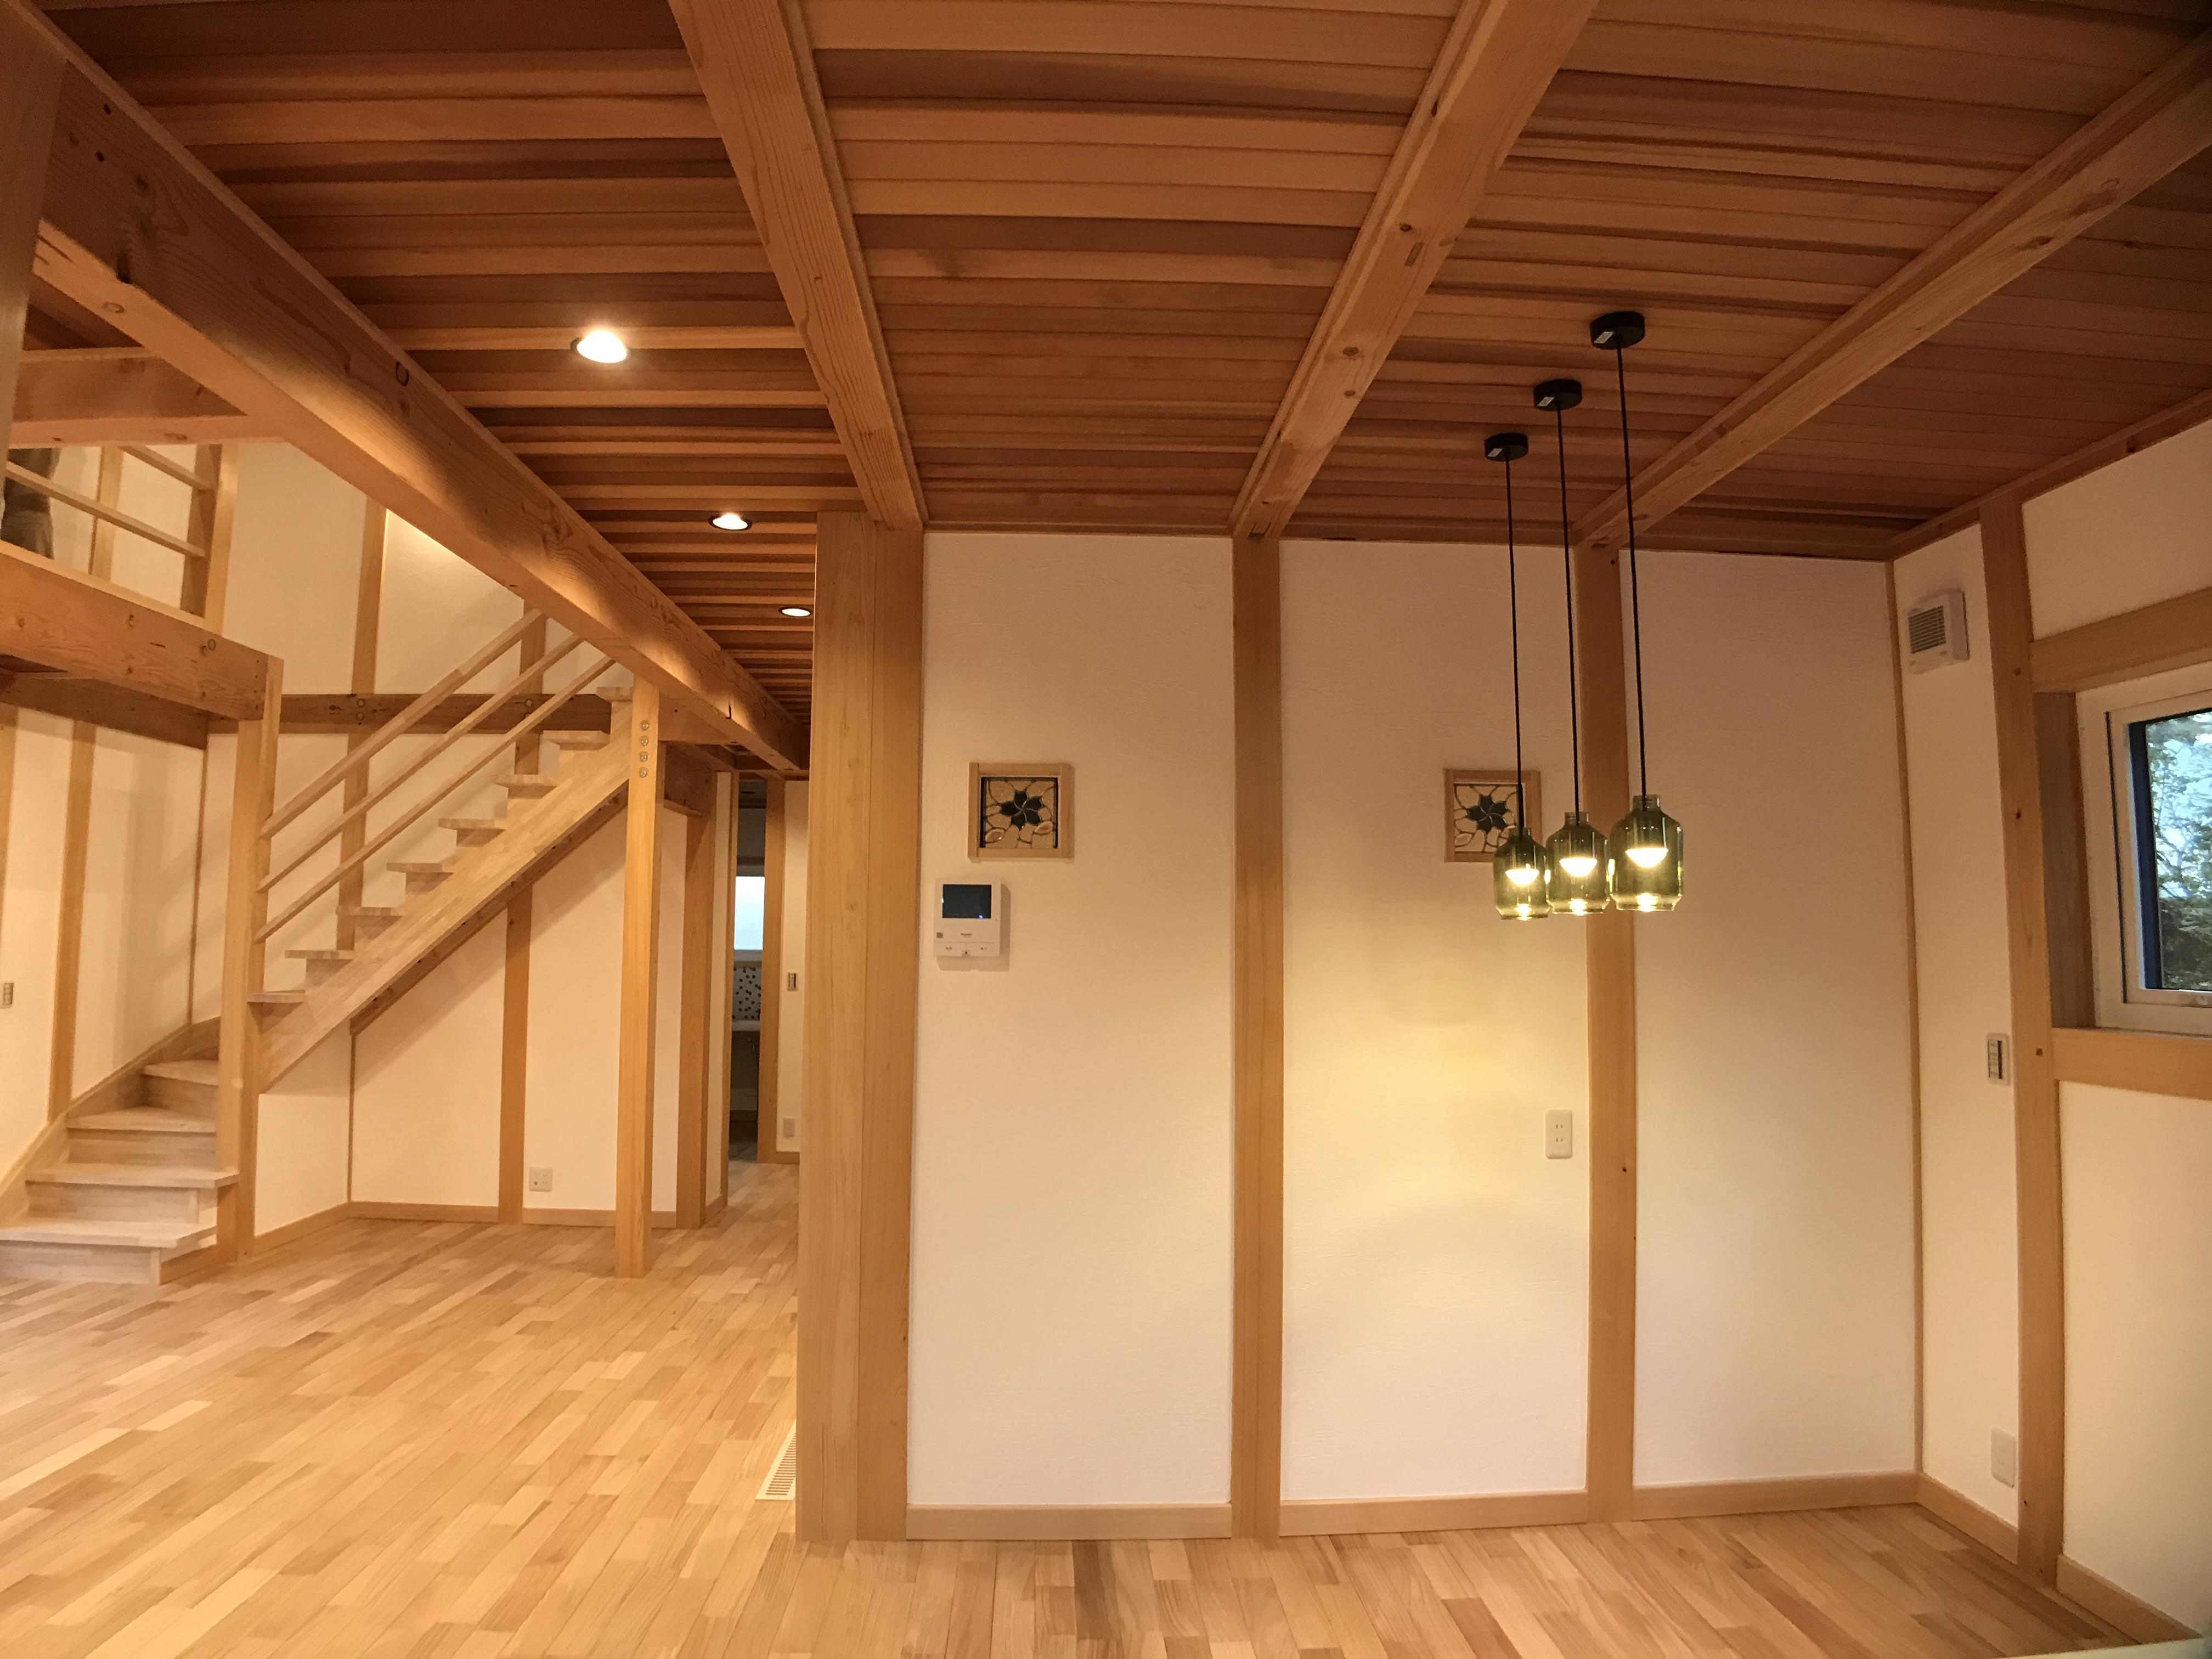 IMG_1494 - 坂井工務店 | 山口県山口市佐山 | 木造住宅、注文住宅の工務店